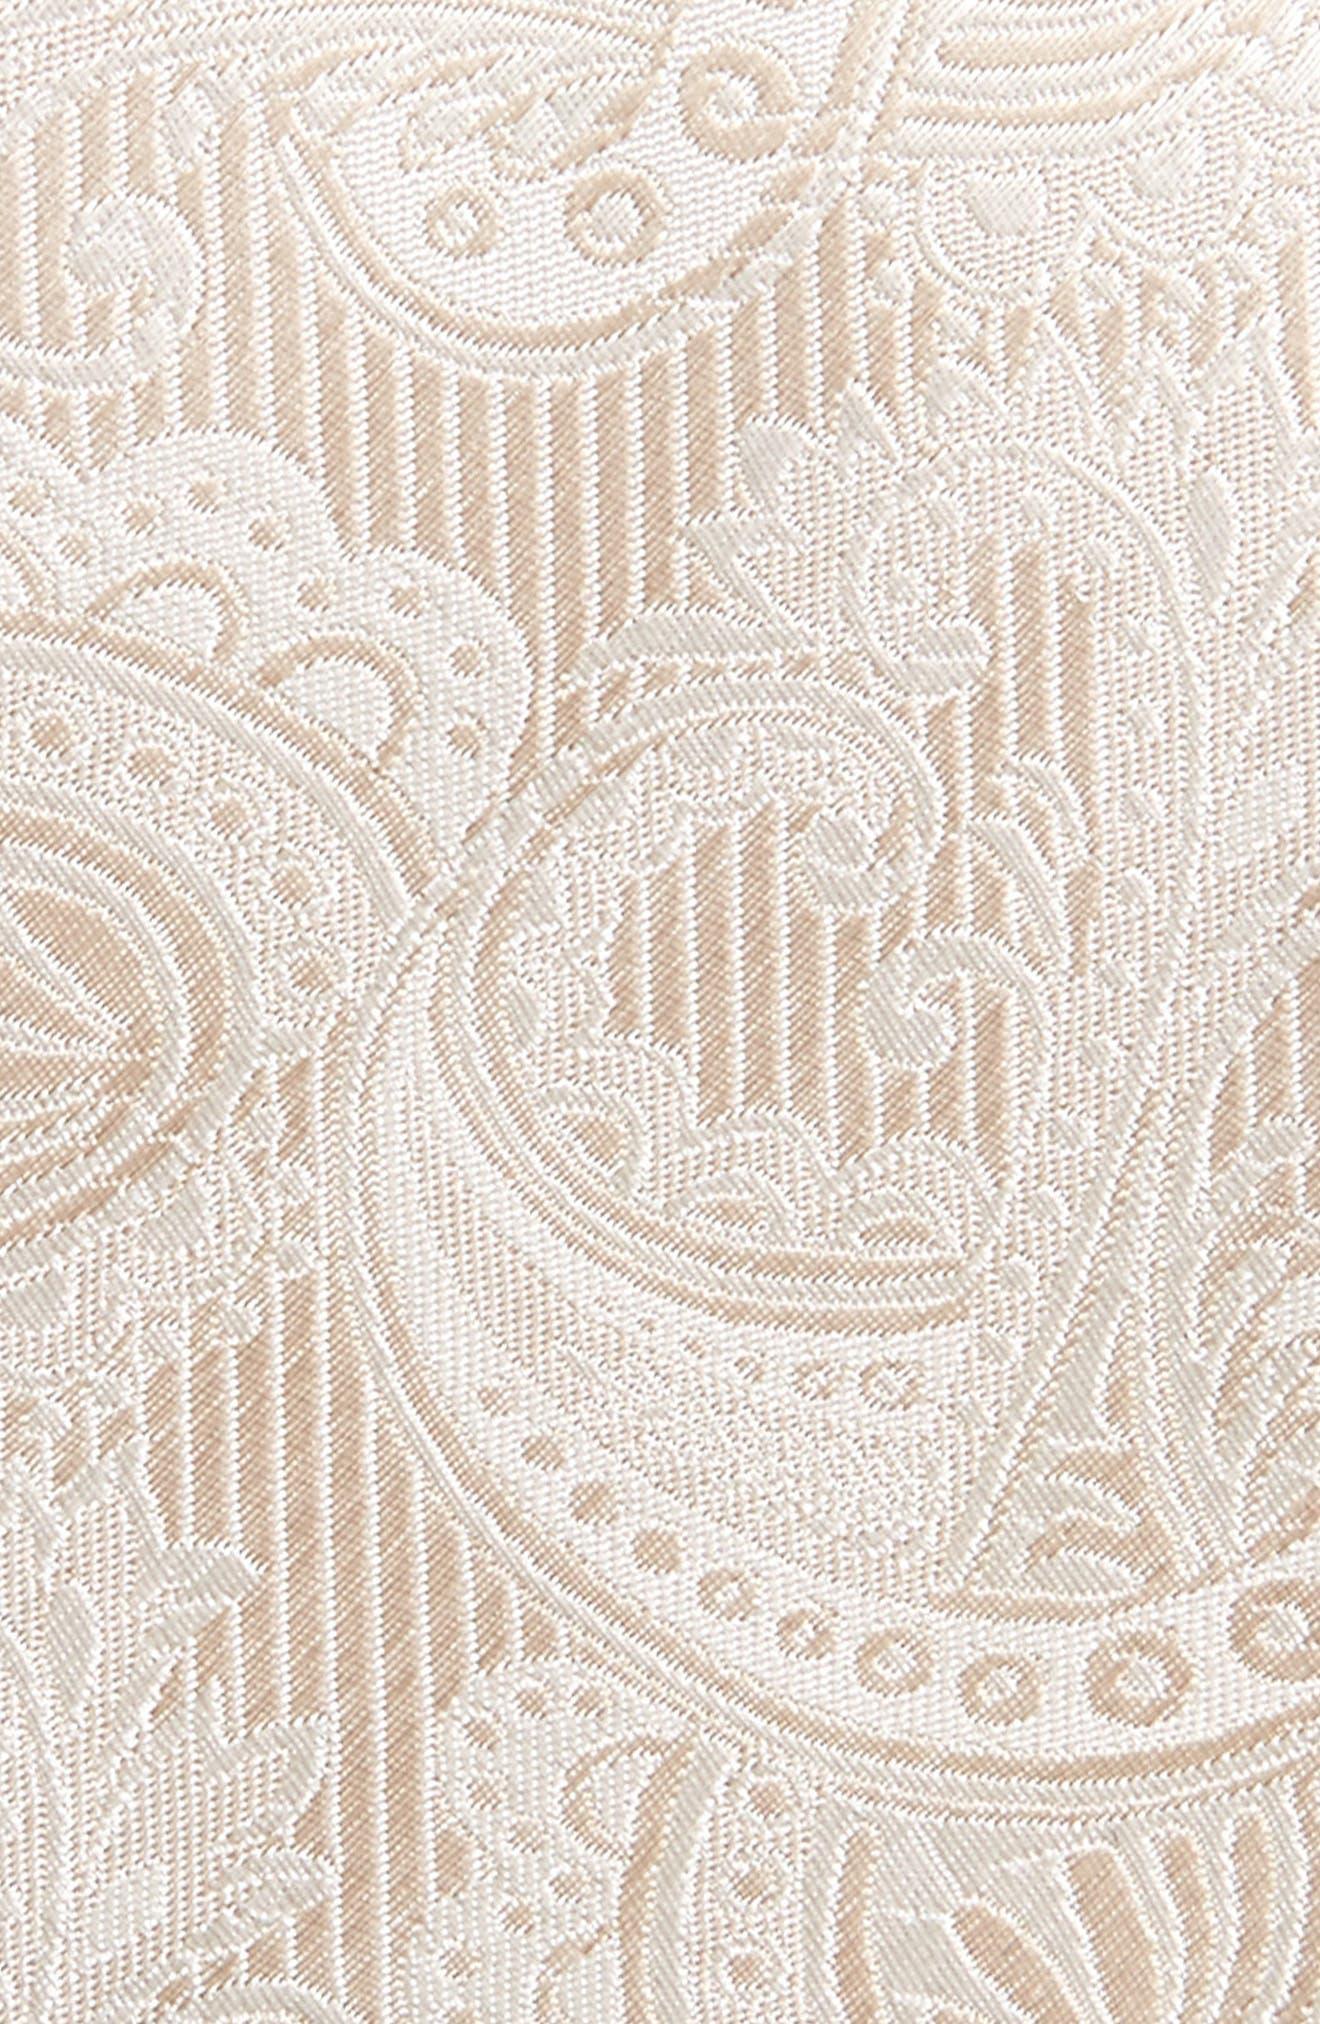 Paisley Silk Tie,                             Alternate thumbnail 2, color,                             270